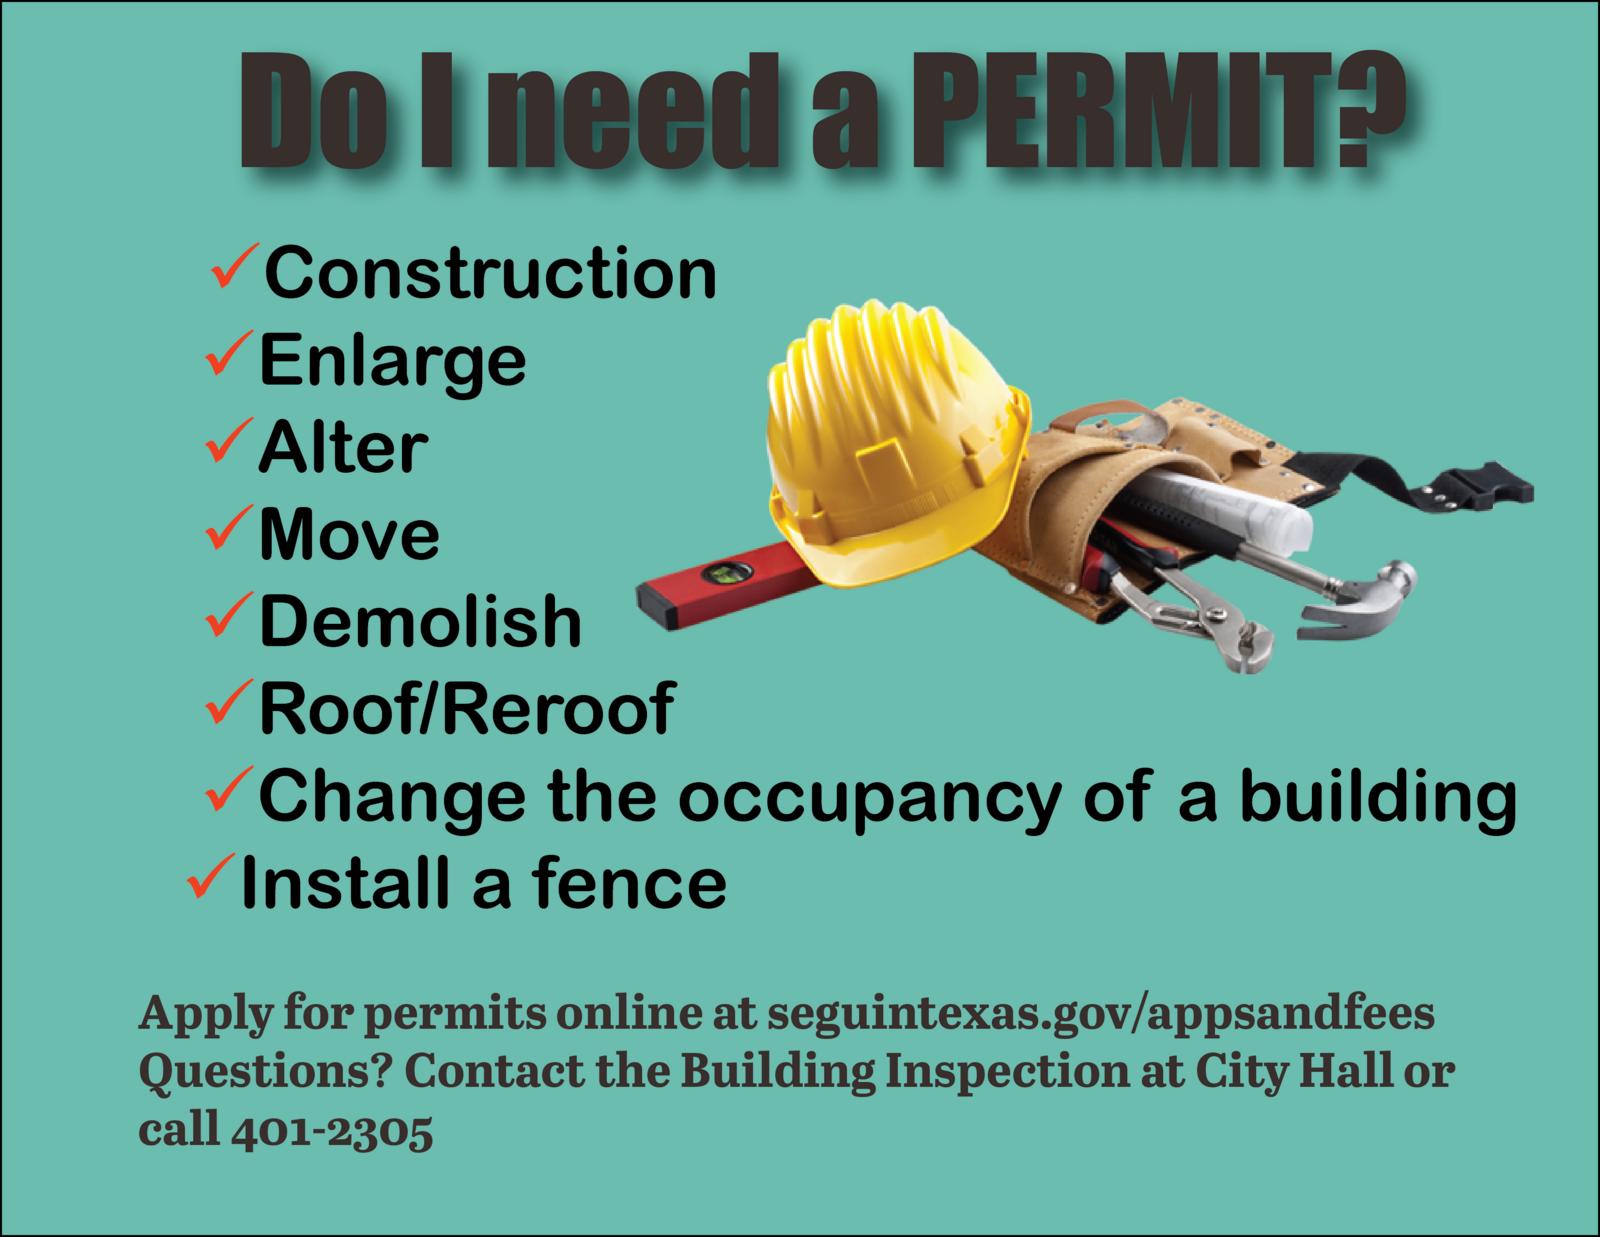 Do I need a building permit? (City of Seguin) &mdash